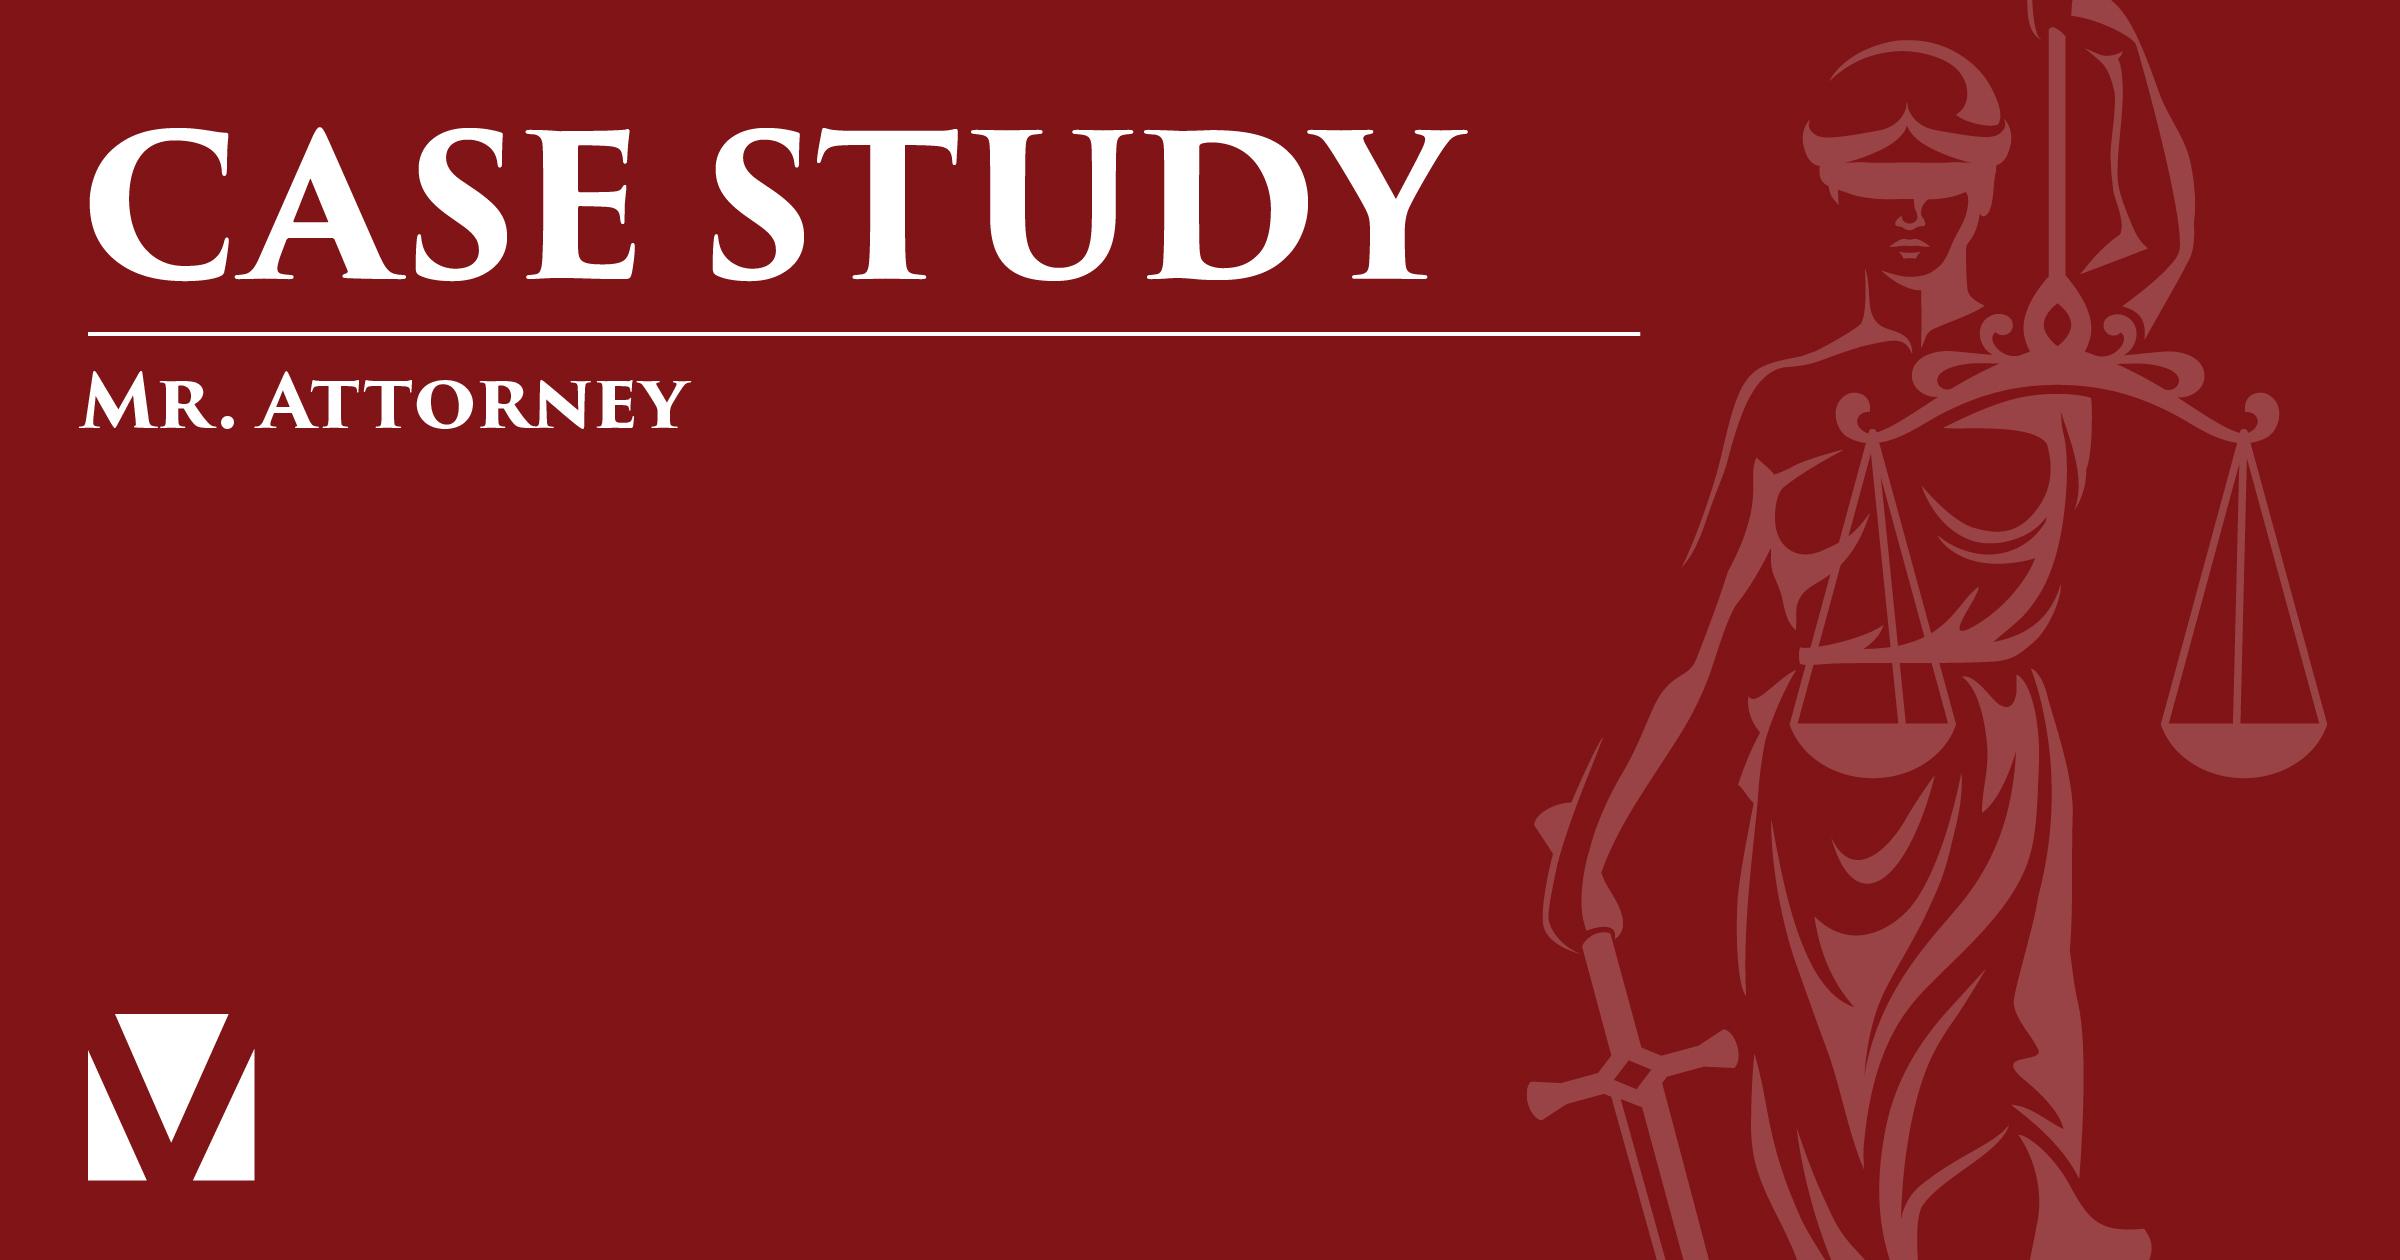 Case Study - Mr. Attorney